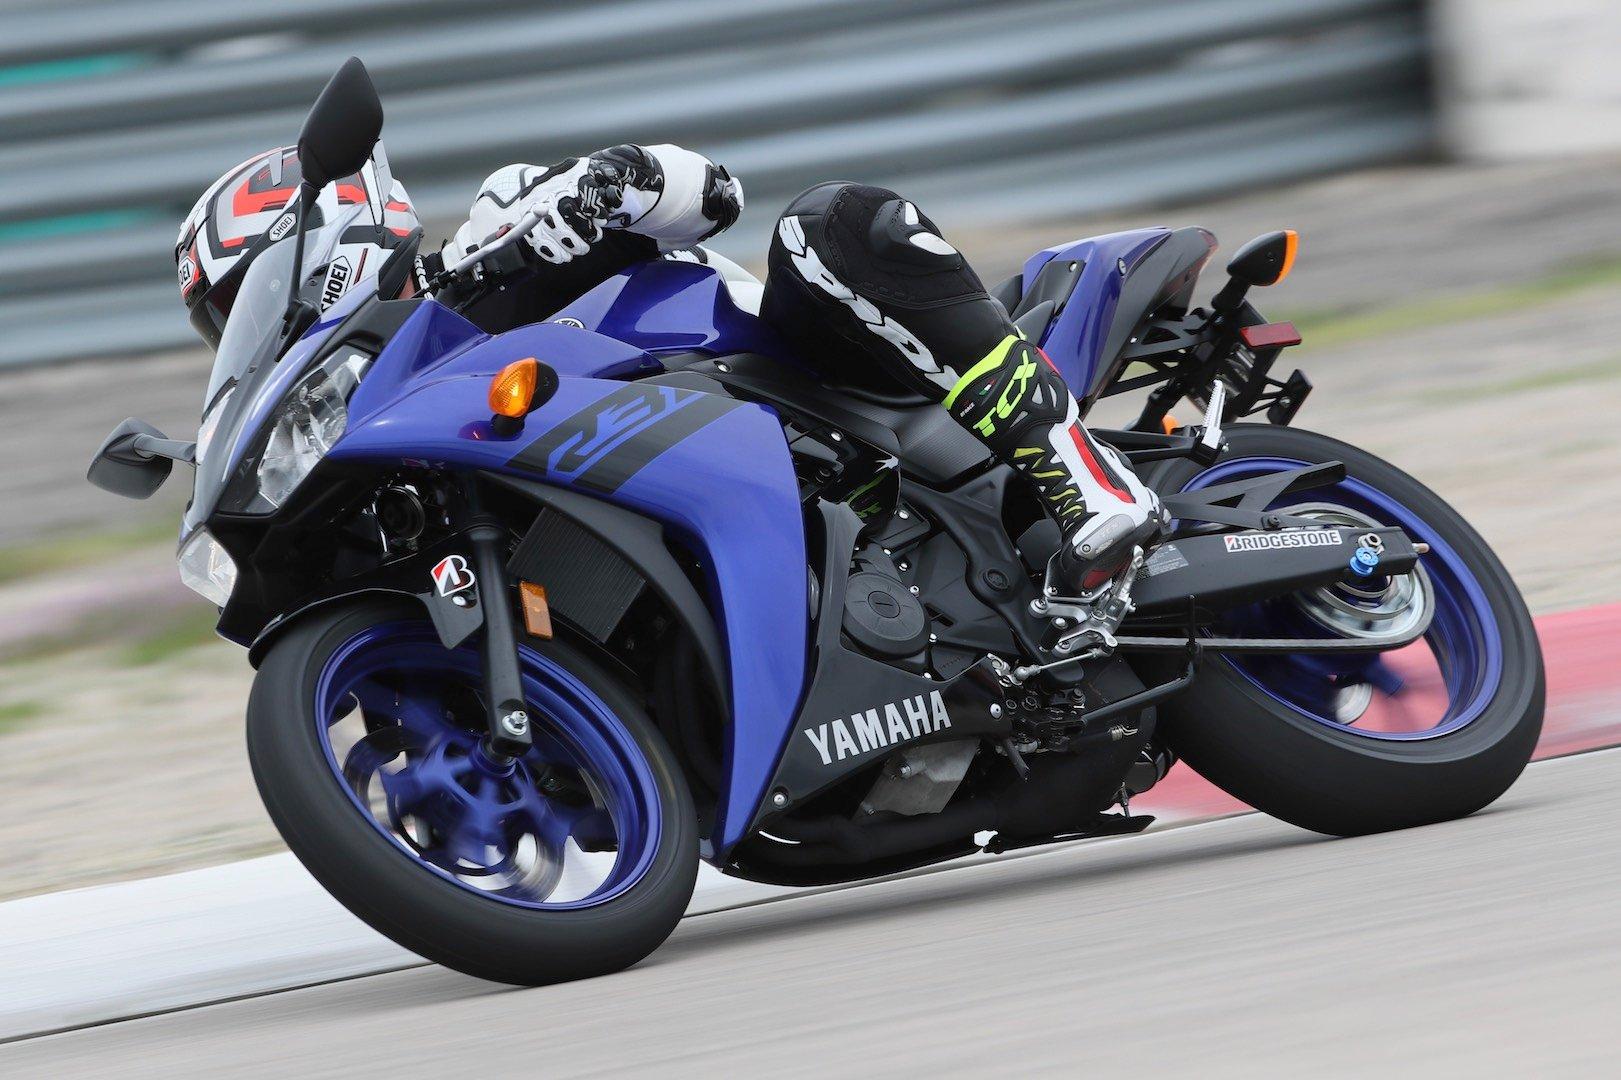 2018 Yamaha Sportbike Lineup Review: R3, R6, R1 + R1M